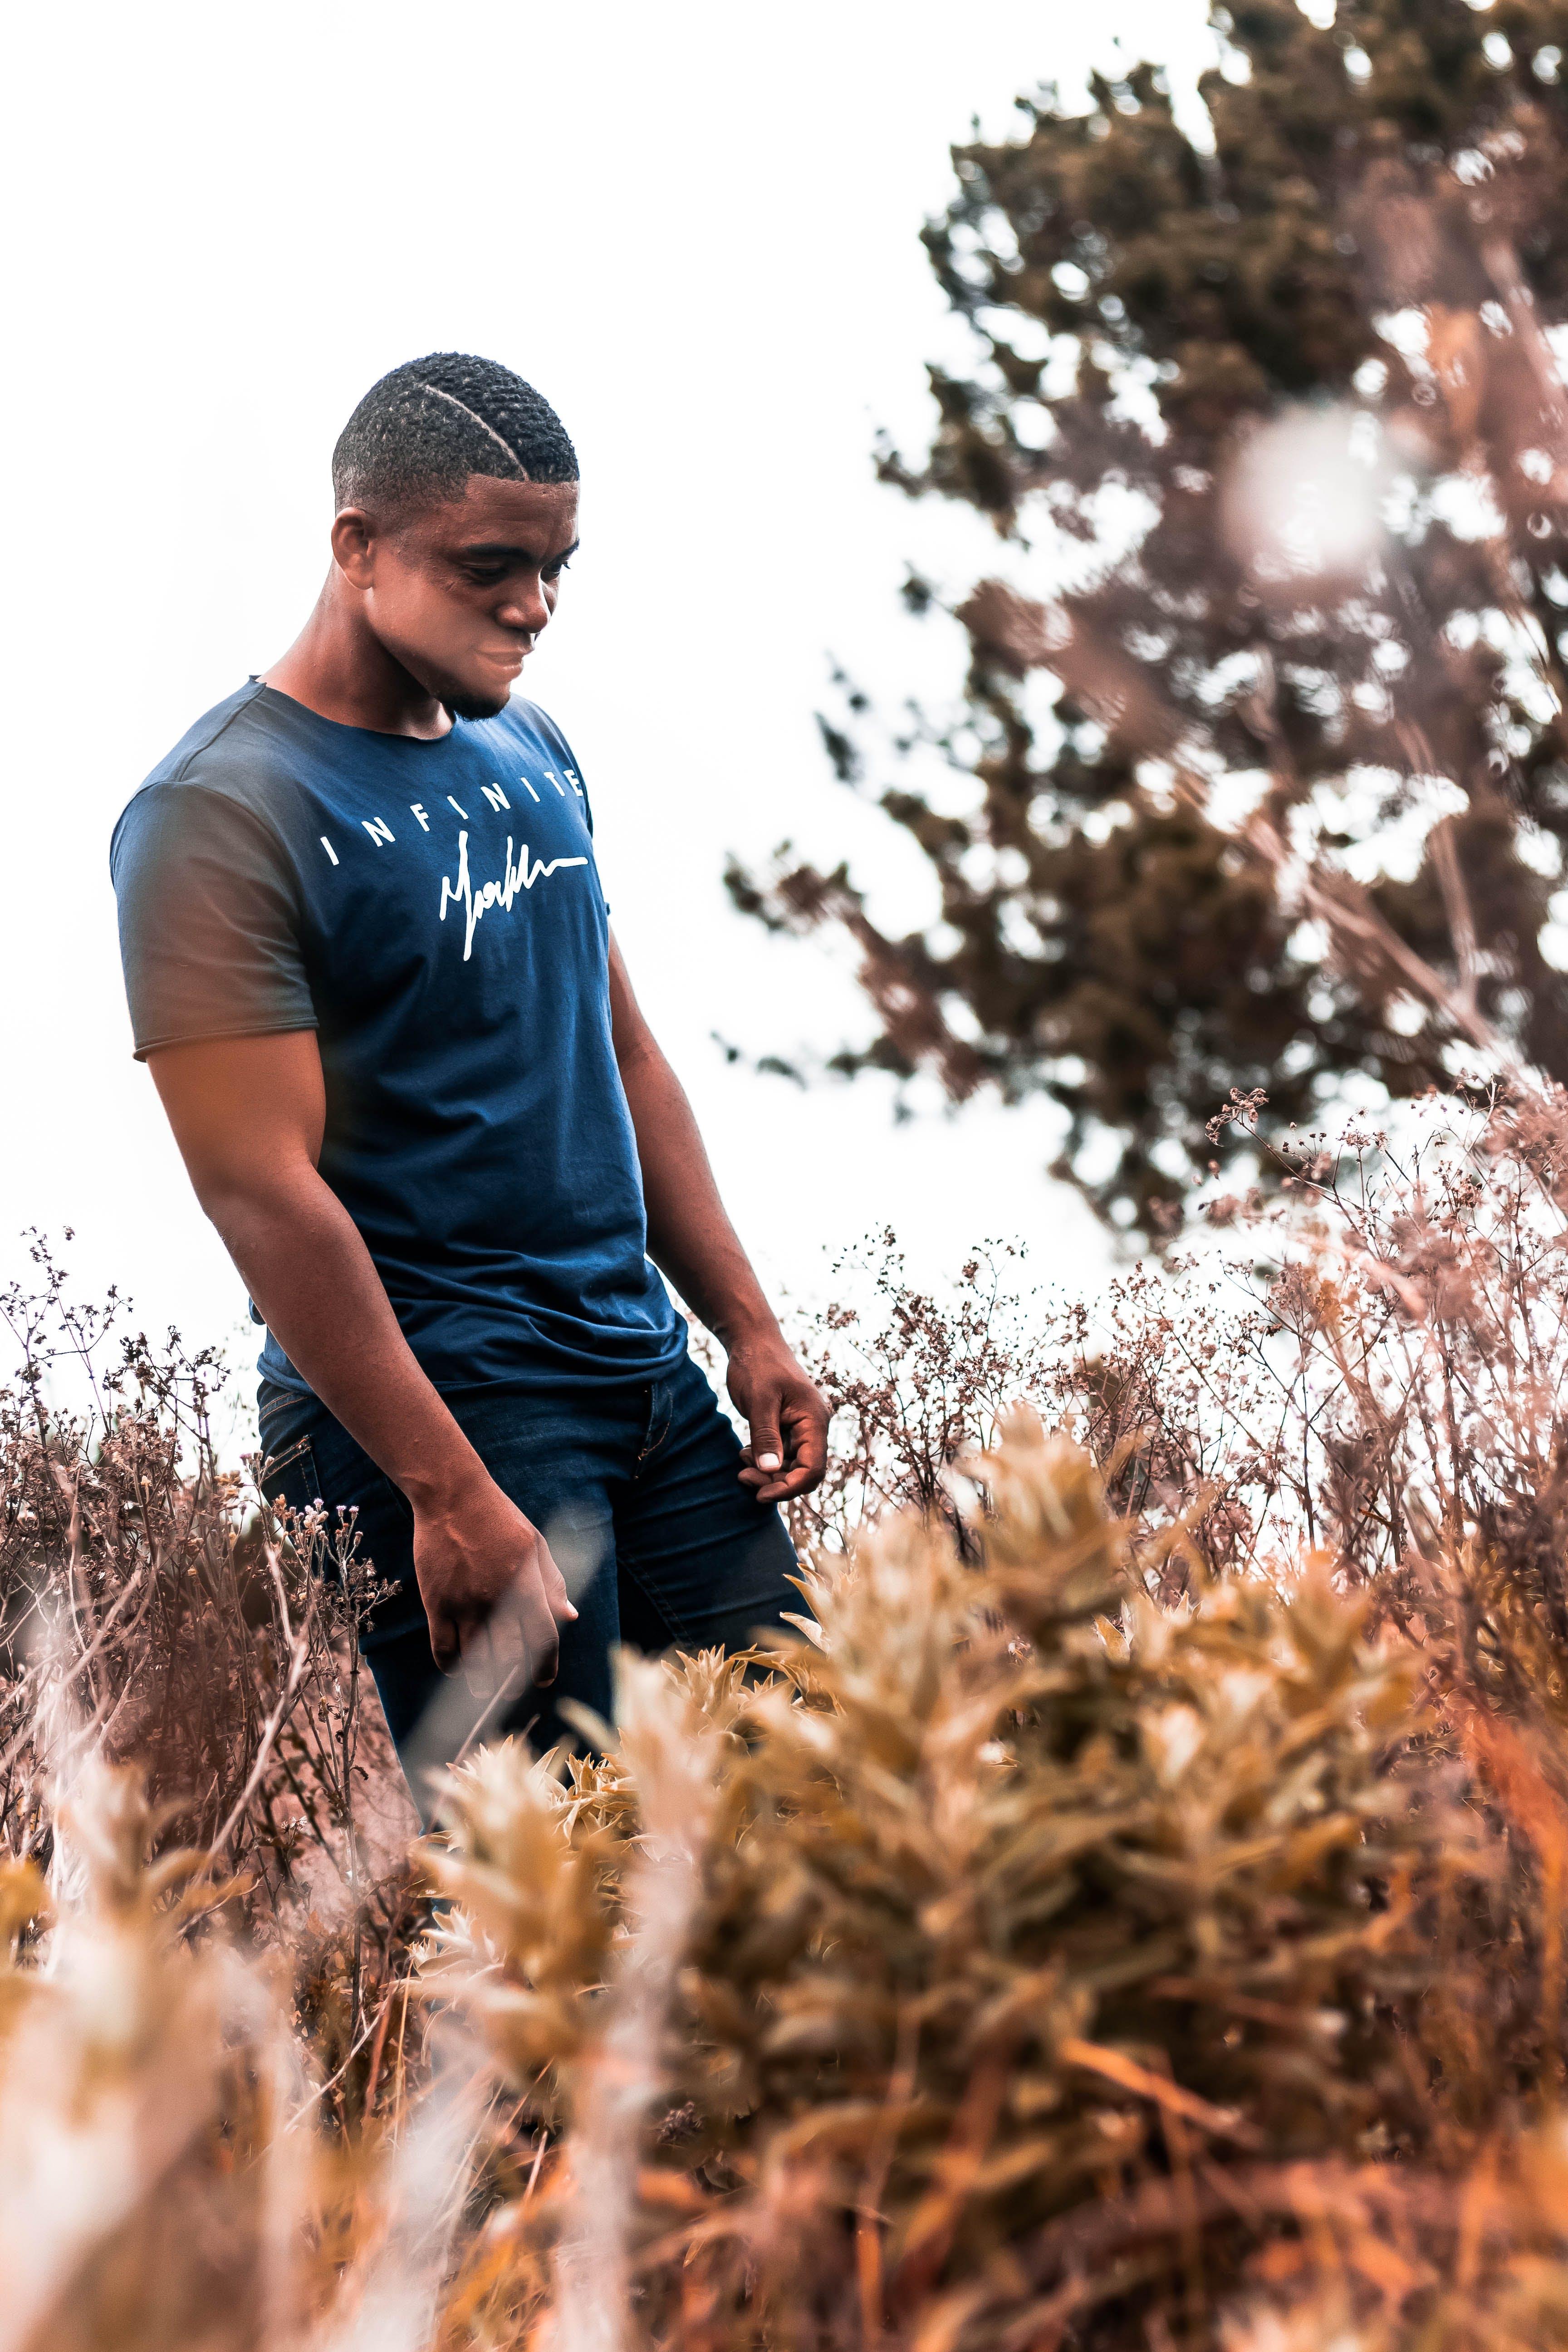 Man Wearing Blue Crew-neck T-shirt Standing Near the Tree Outdoor